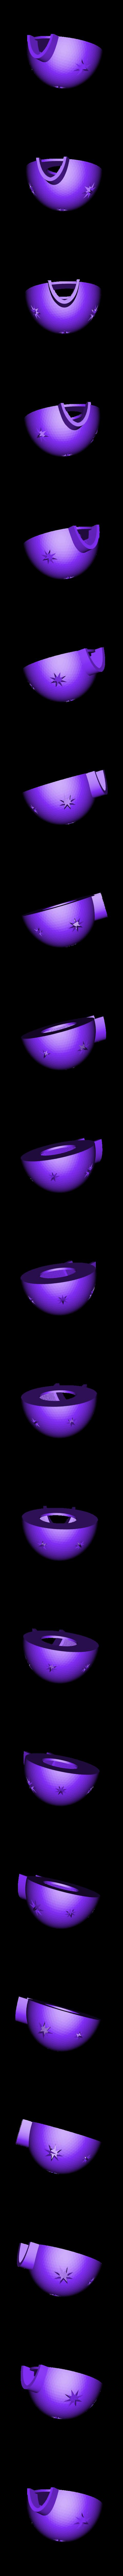 igloo 1.stl Download STL file Igloo box and tealight • 3D printable design, catf3d